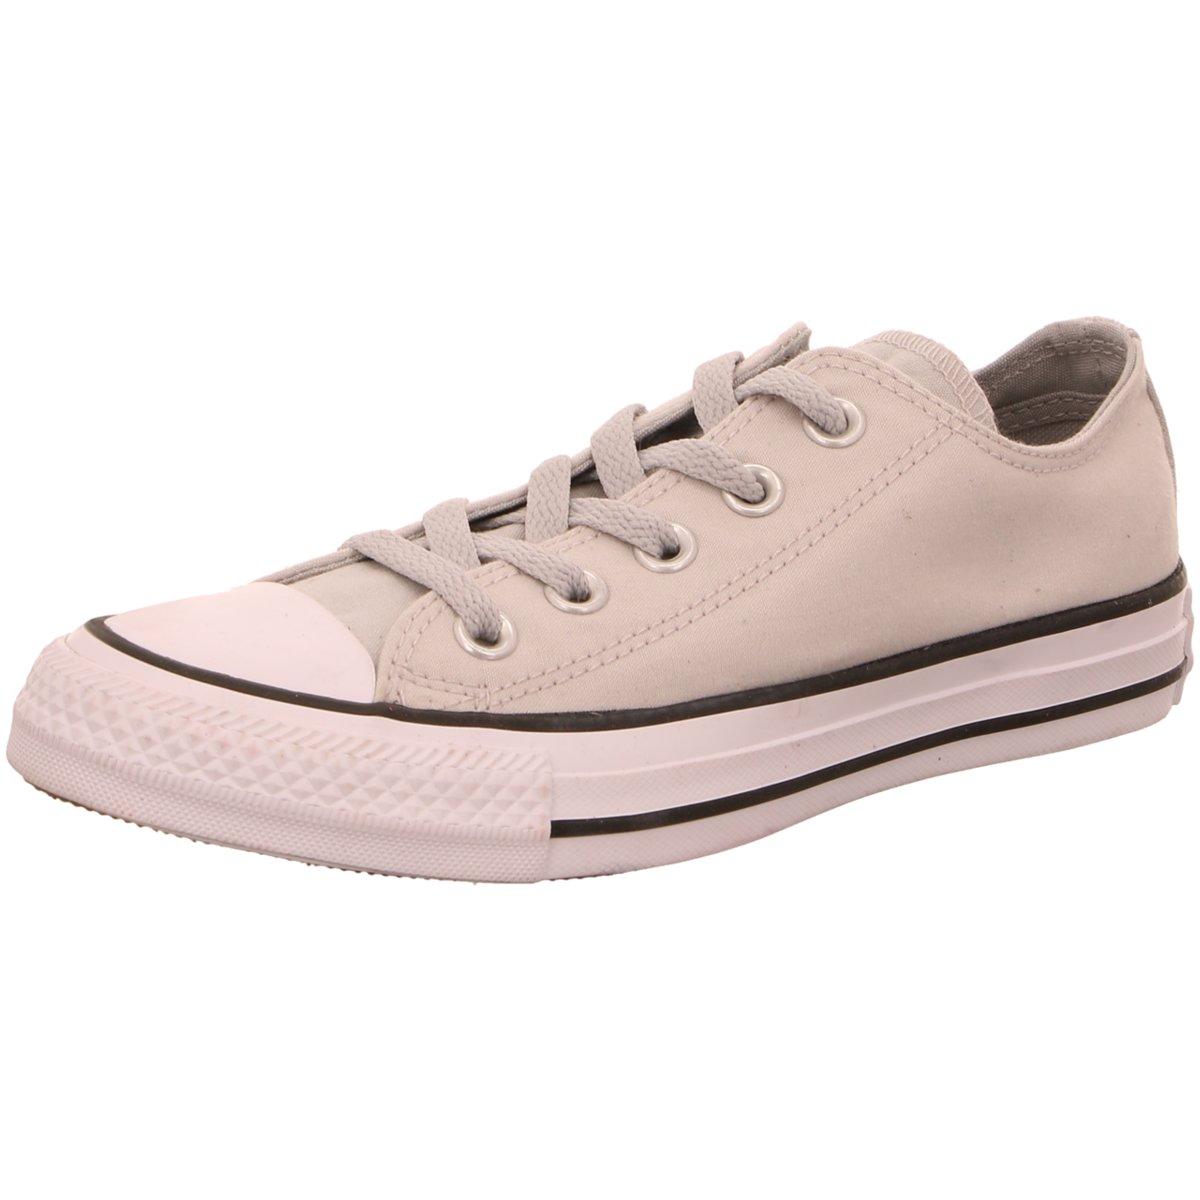 NEU Converse Herren Sneaker Chuck Taylor All Star Sneaker Herren Schuhe grau